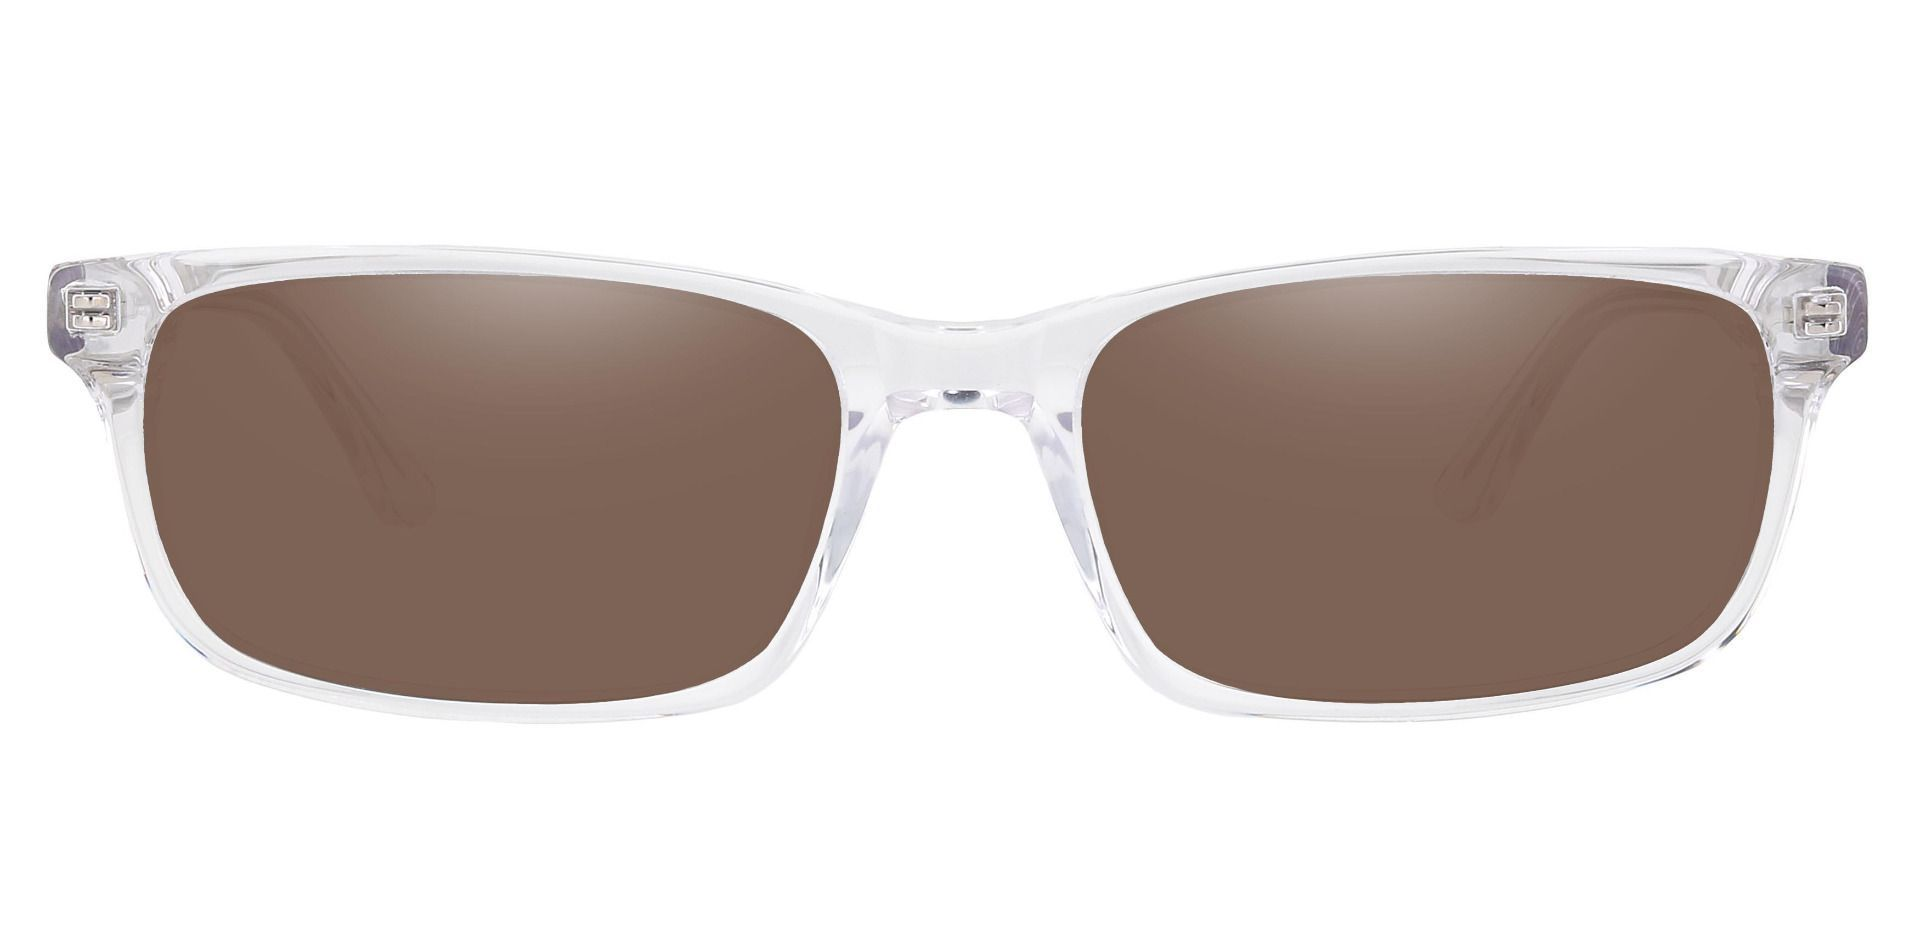 Ennis Rectangle Prescription Sunglasses - Clear Frame With Brown Lenses